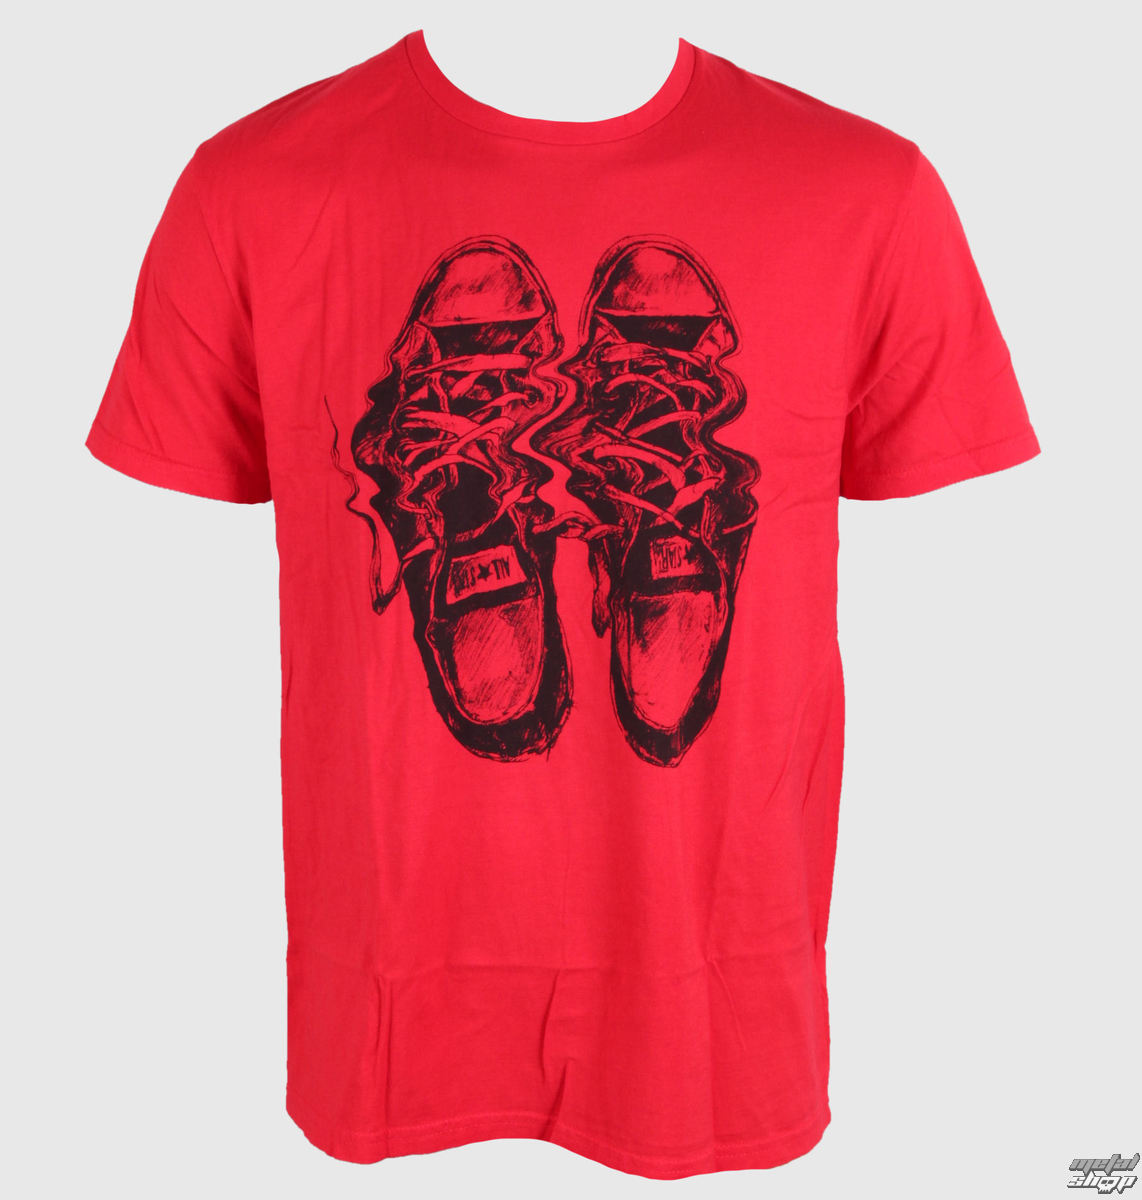 tričko pánské CONVERSE - AMT Distorted Chuck - Red - 06962C-642